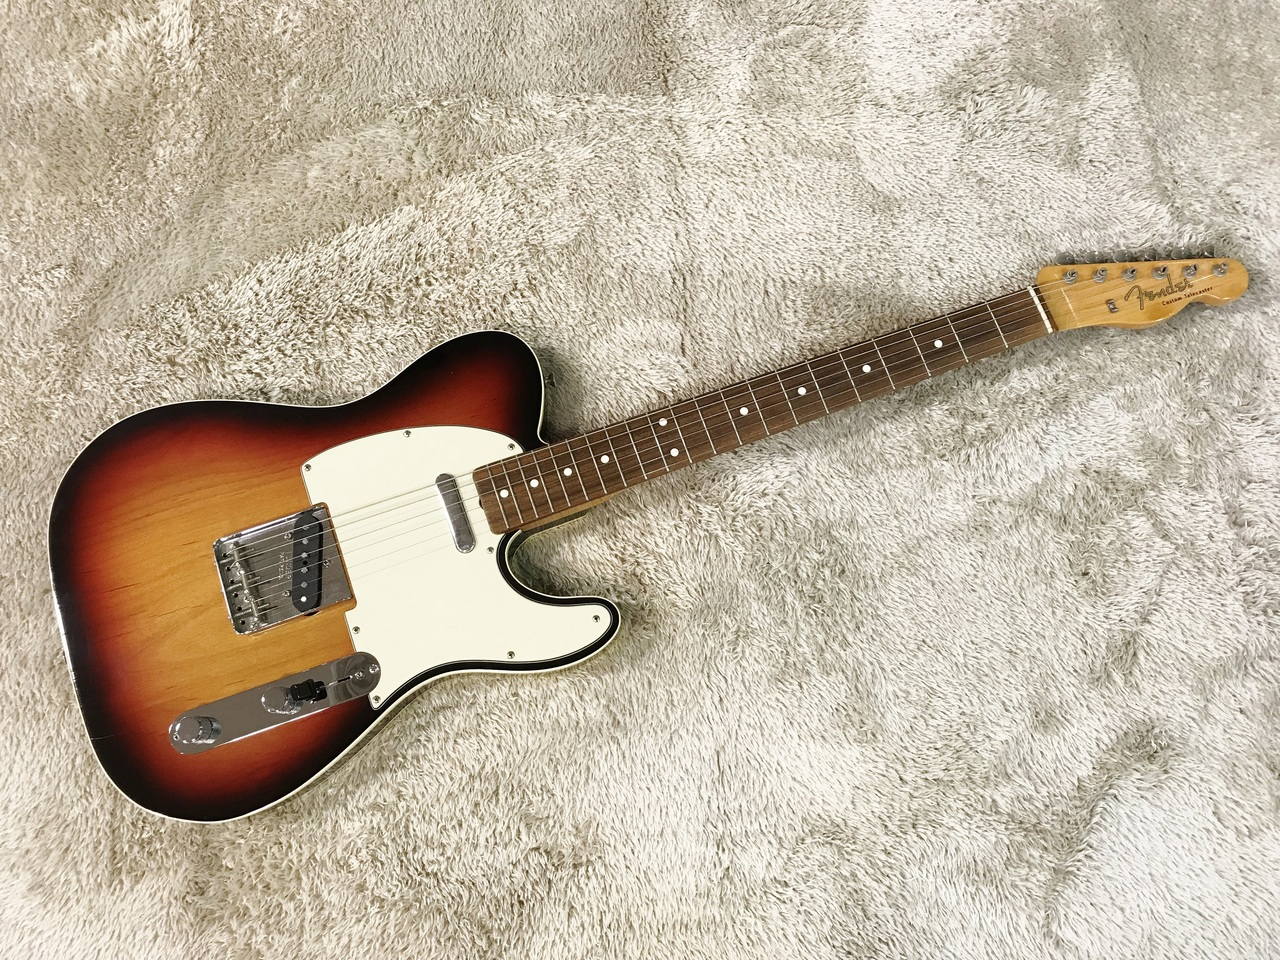 Fender American Vintage '62 Custom Telecaster 3-Color Sunburst [used article] [Made in 2008]